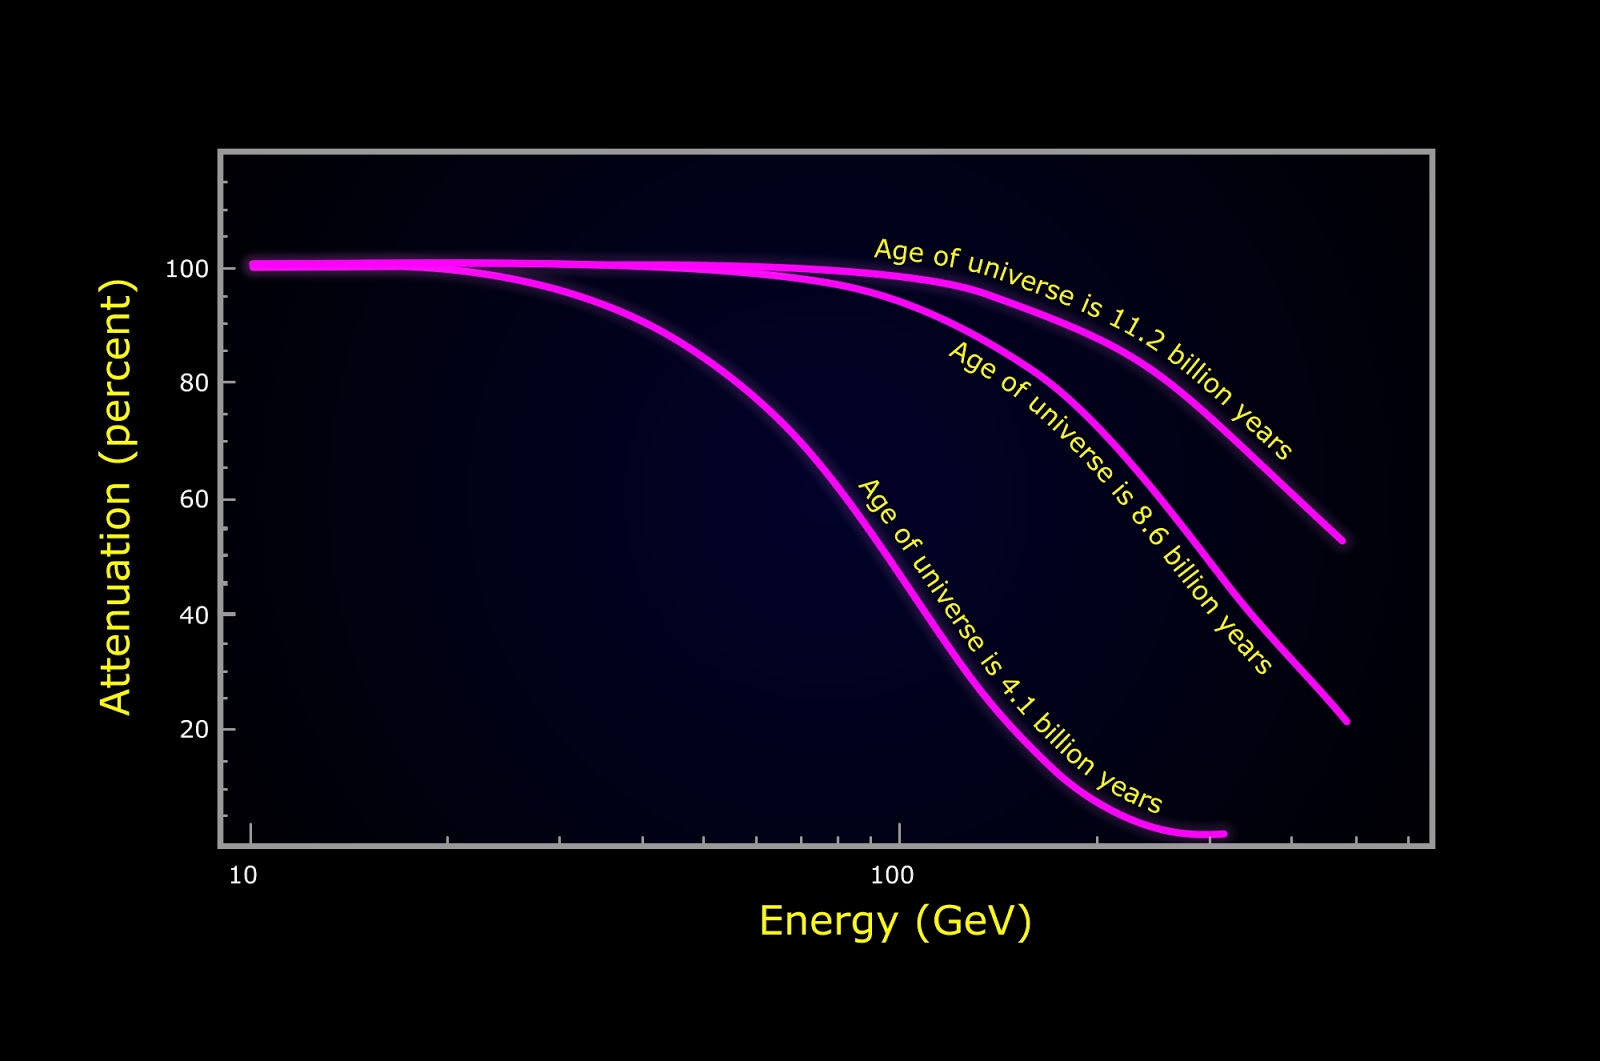 Orbiter ch Space News: 2012-10-28